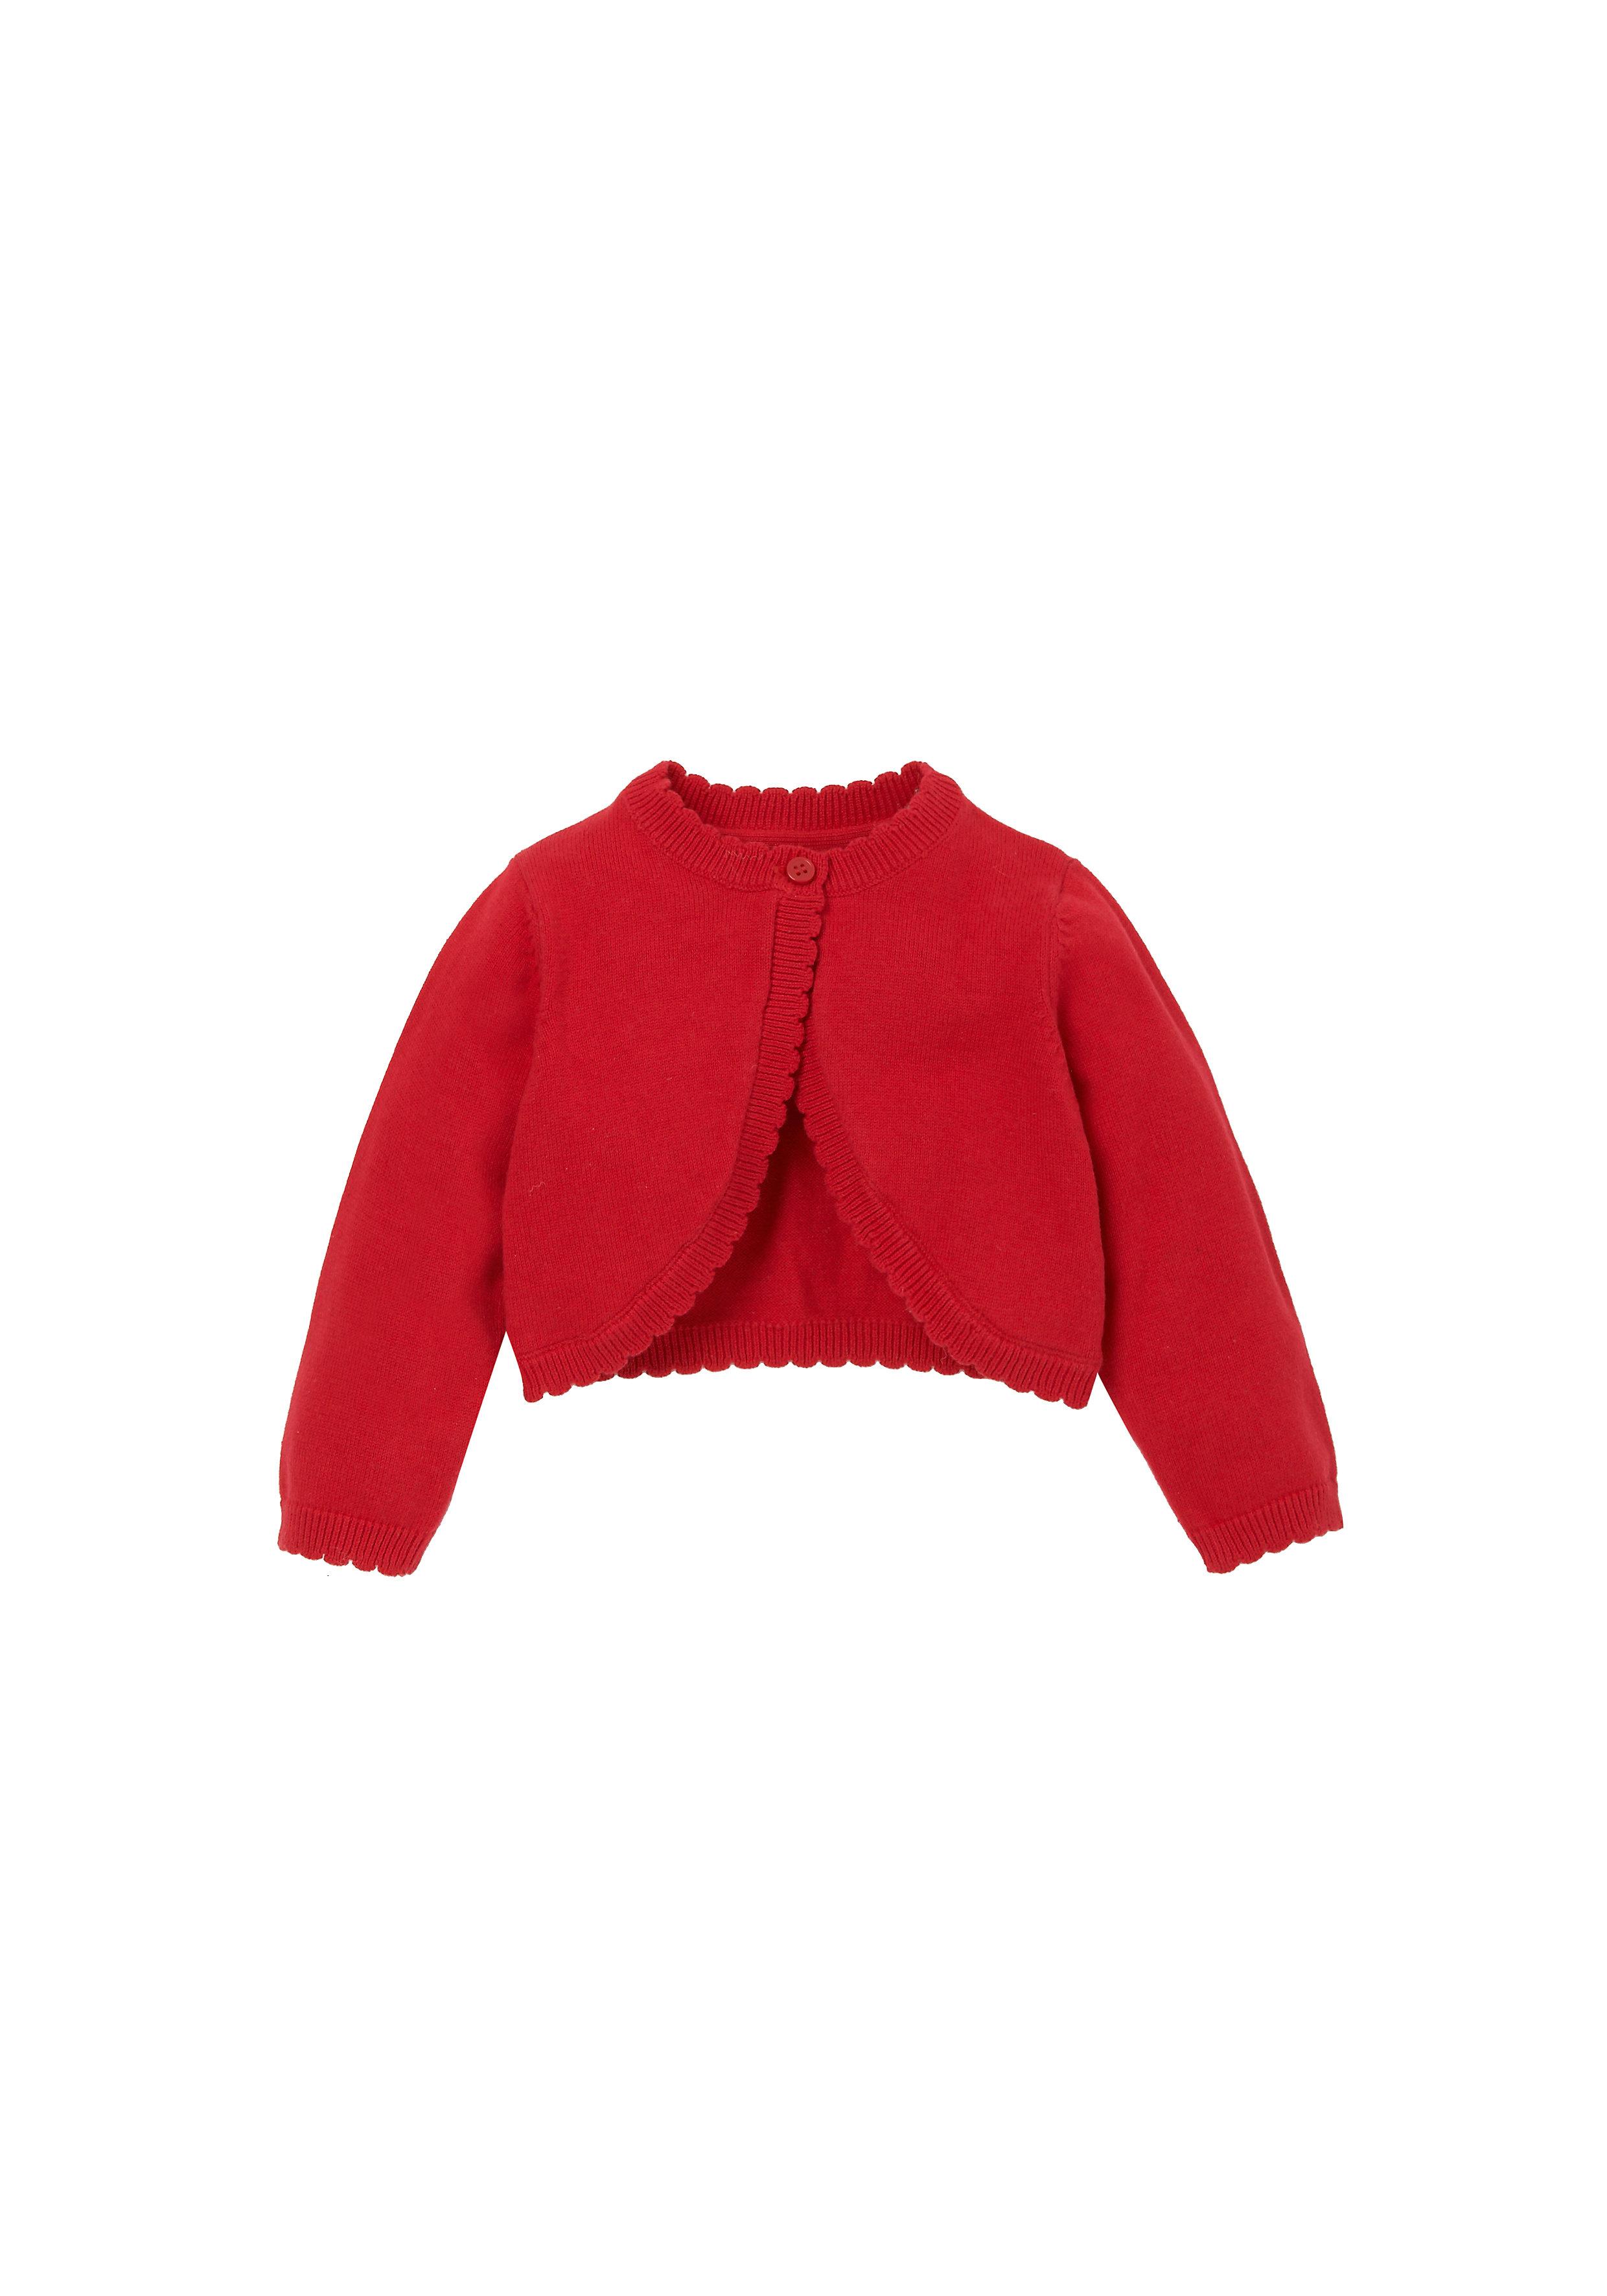 Mothercare | Girls Bolero - Red